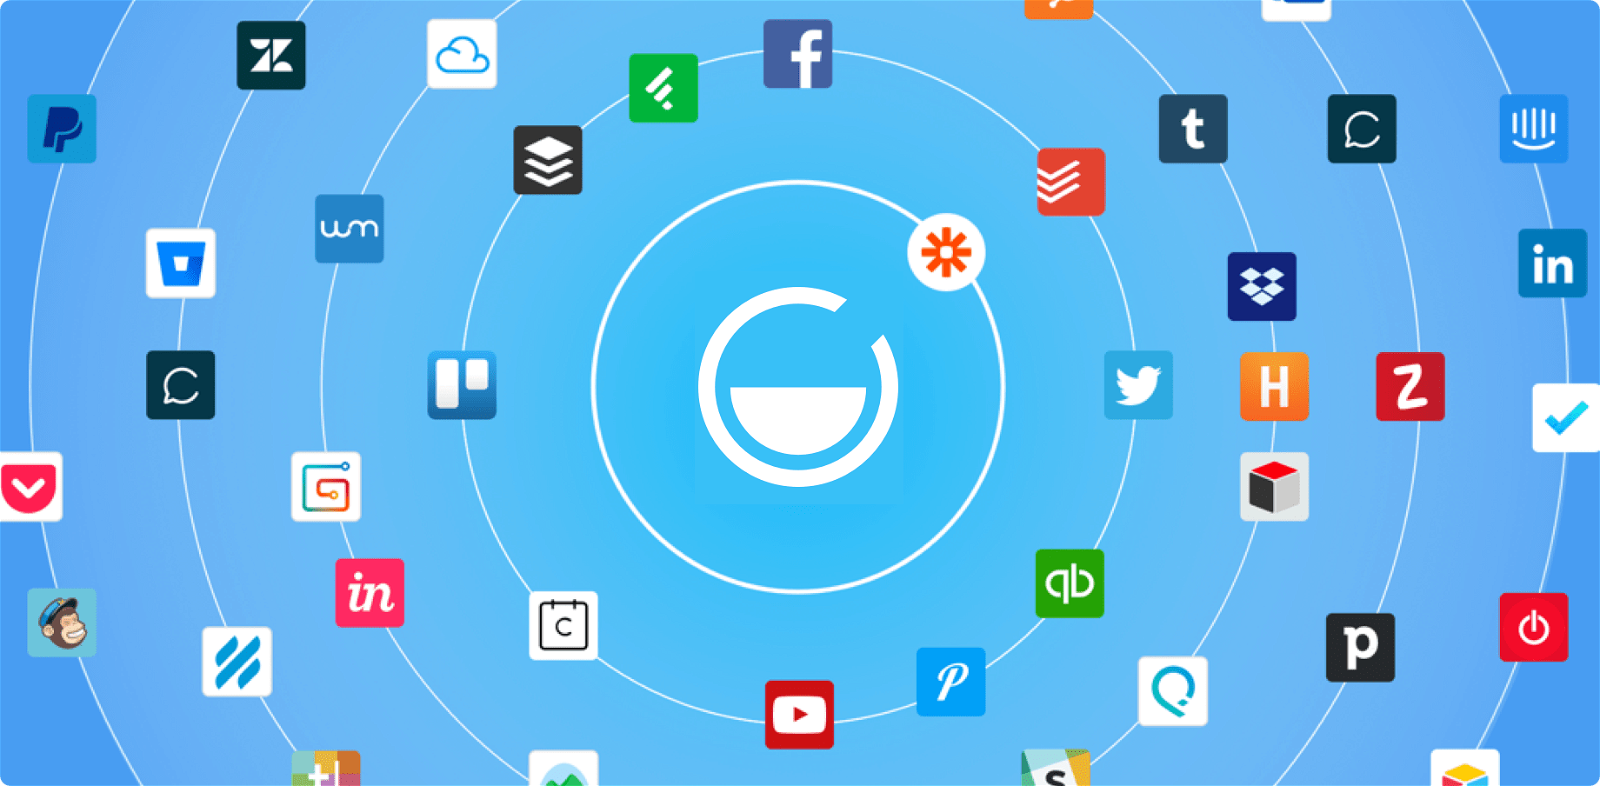 Getsitecontrol now integrates with 1,000 other apps via Zapier!